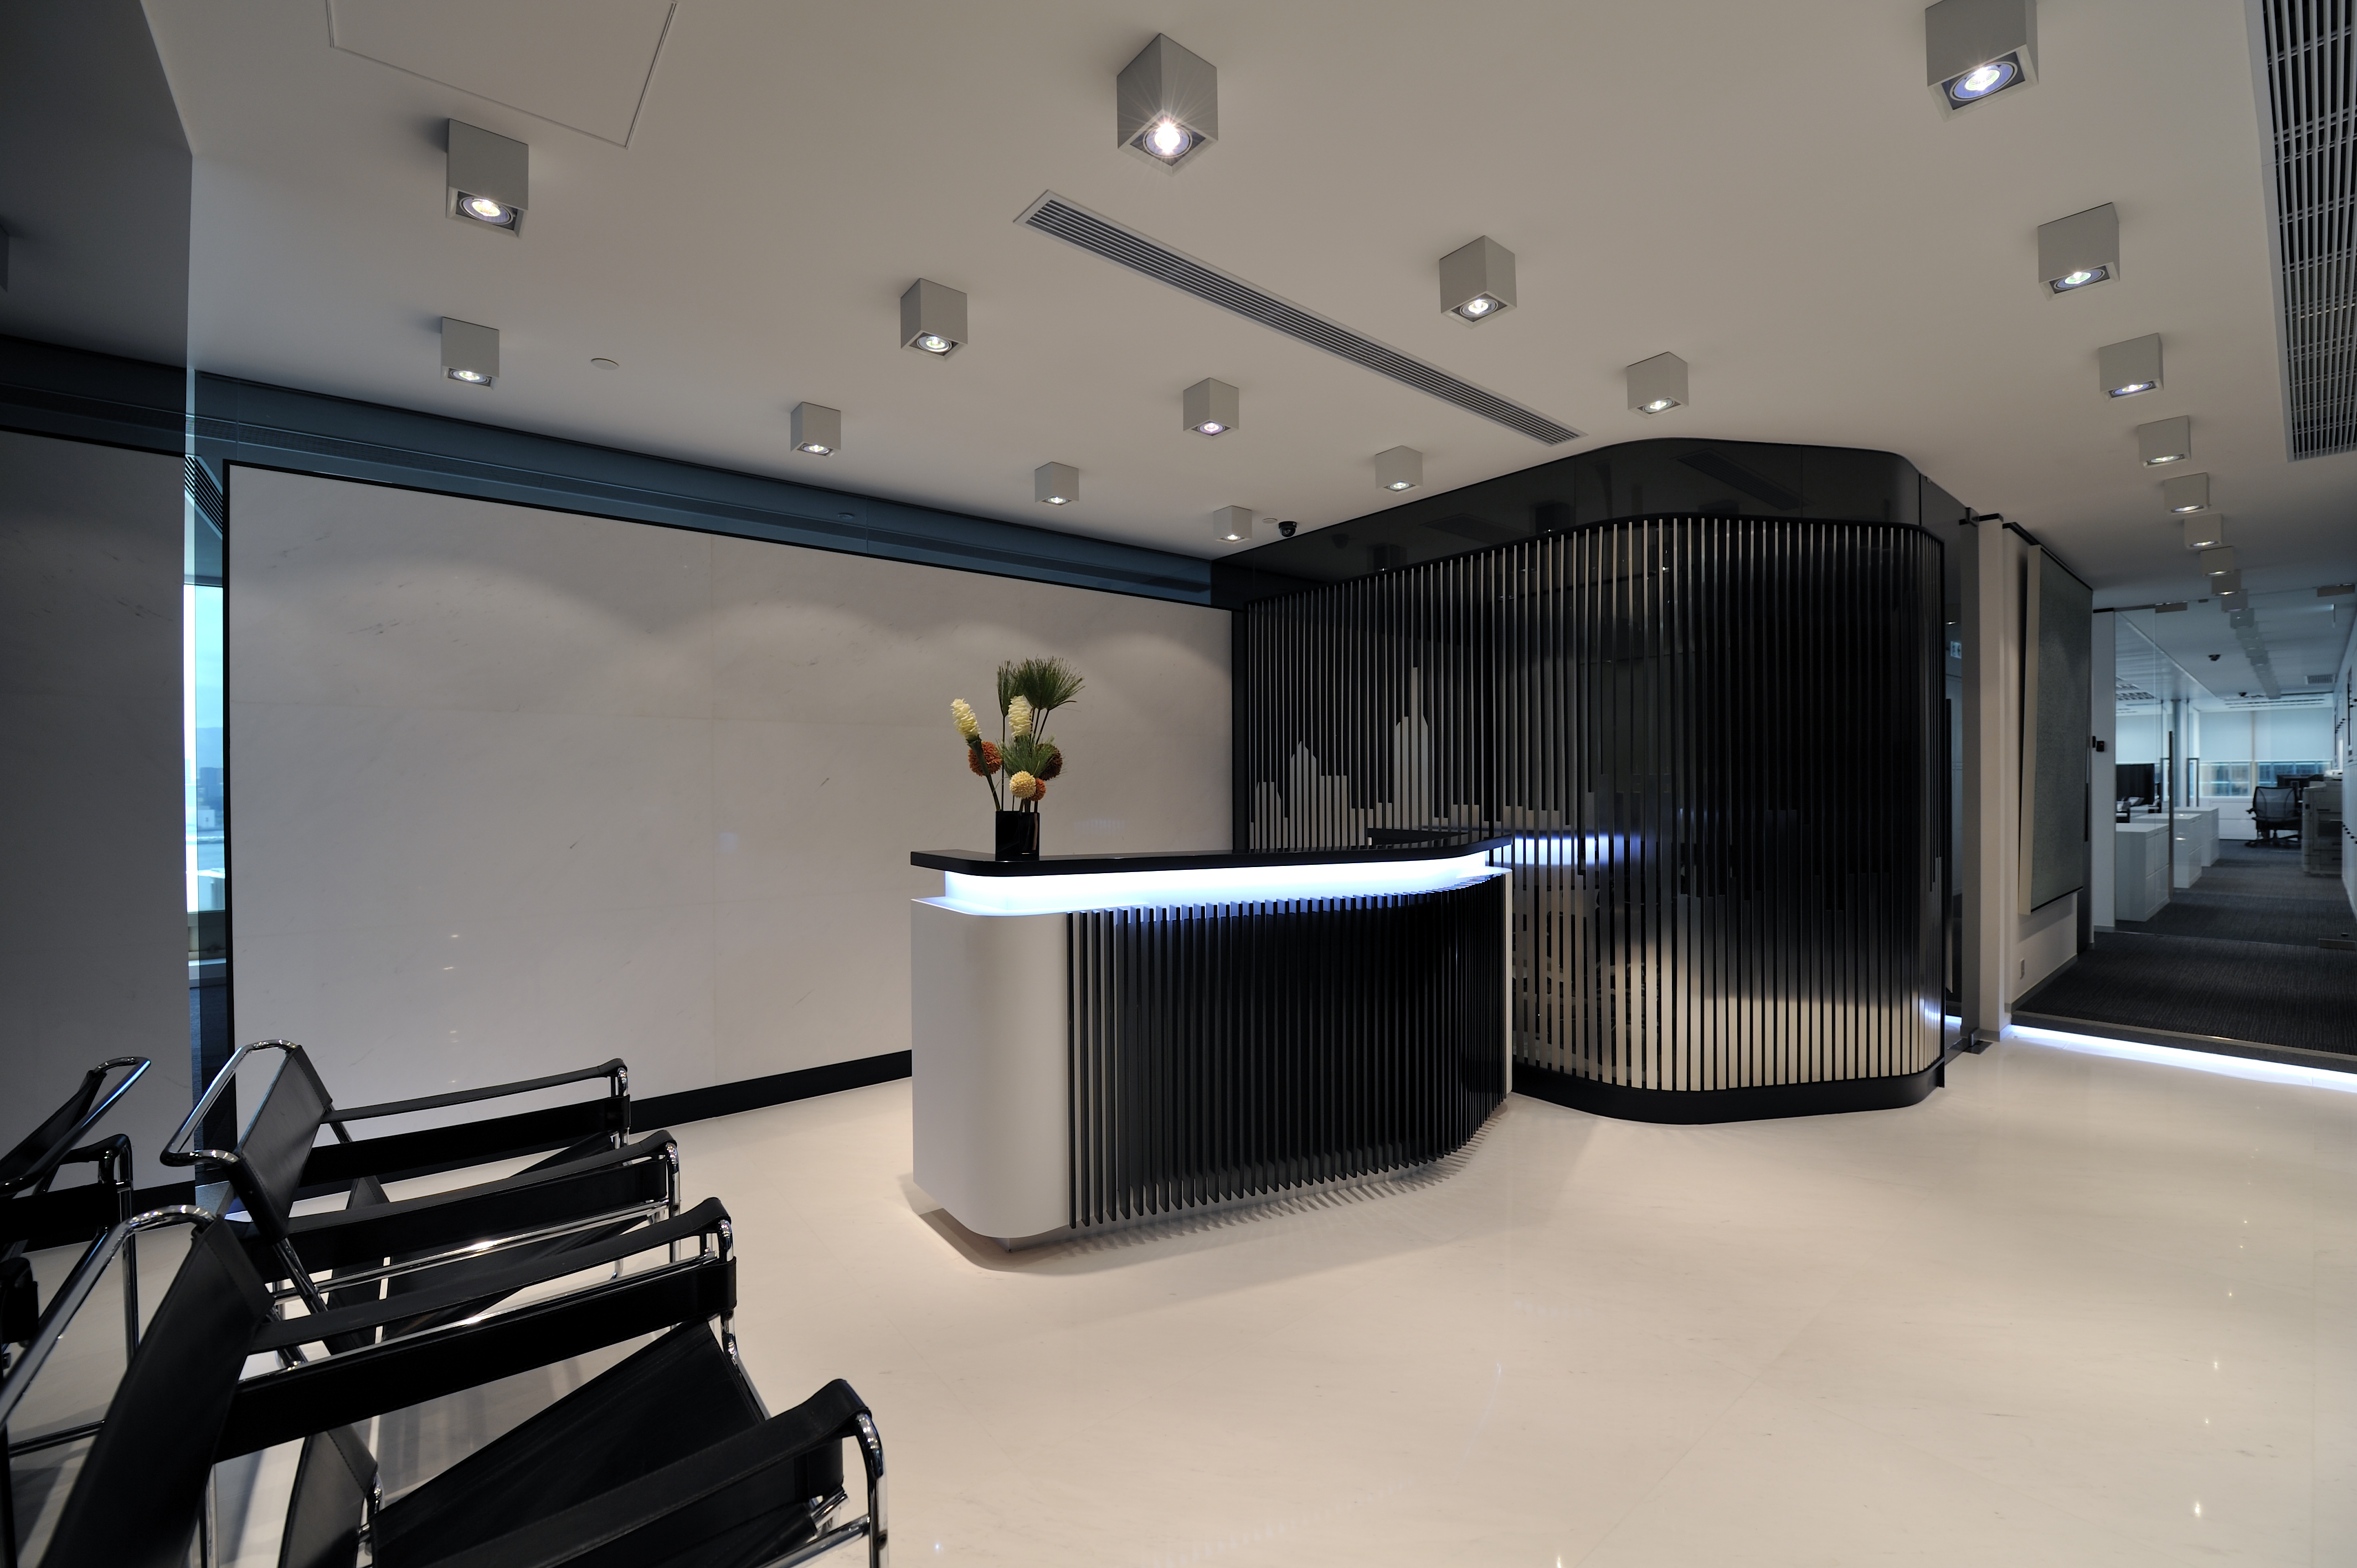 辦公室設計 Office Design hk Reorient Grou